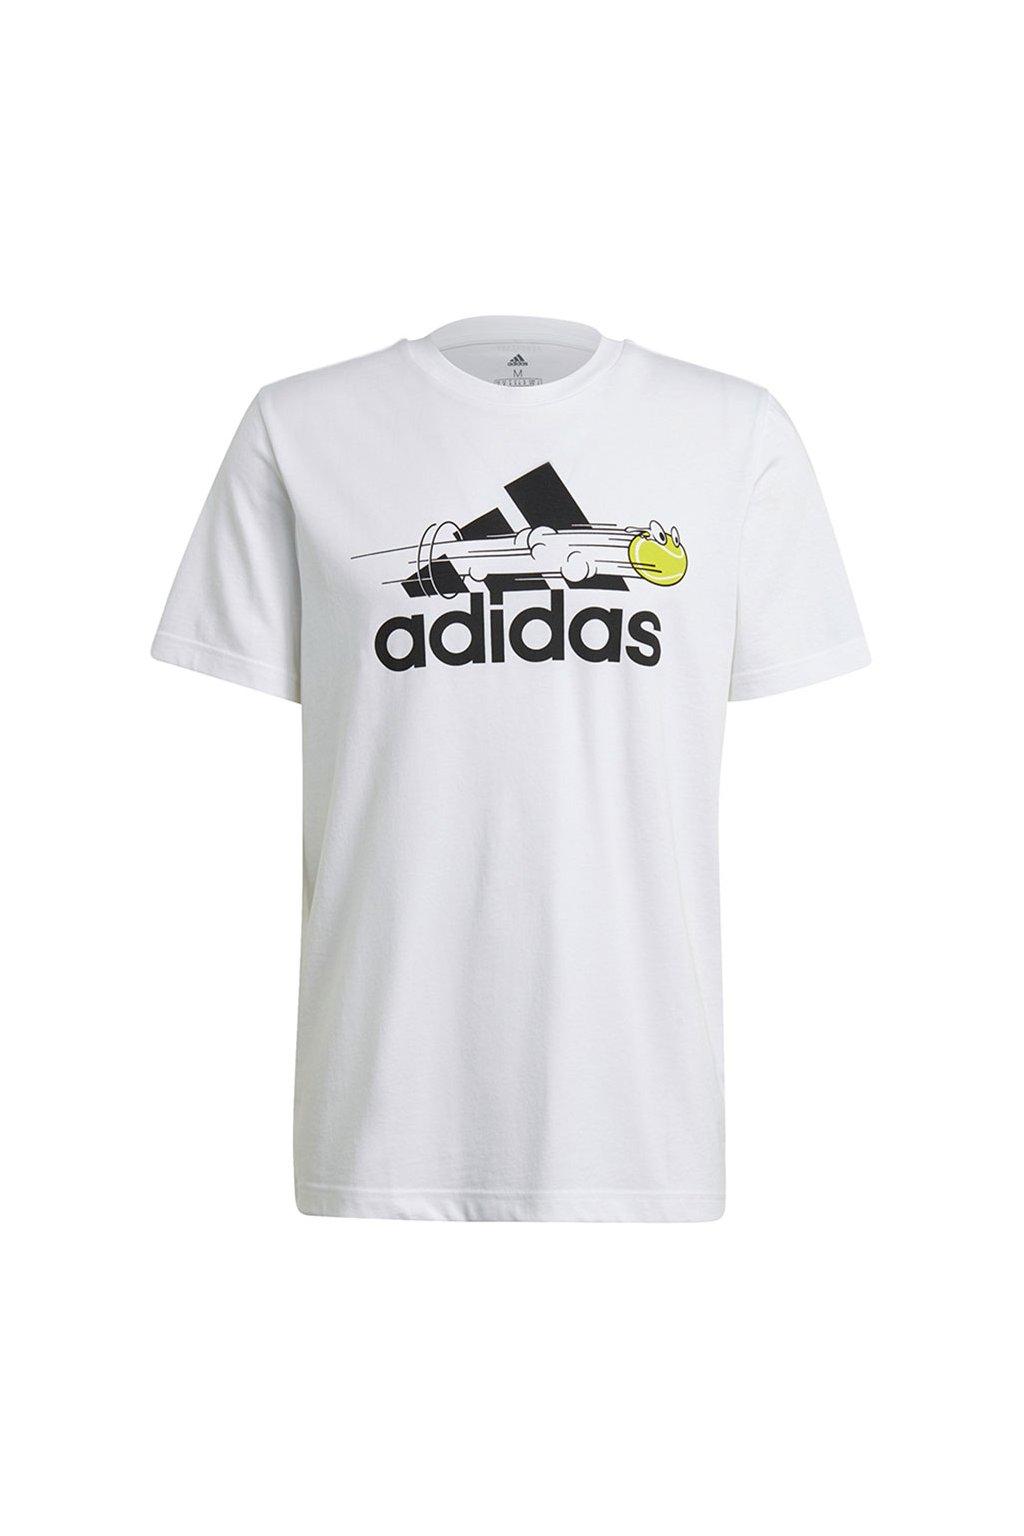 Pánske tričko adidas Tennis Graphic Logo T-shirt biele GN8058